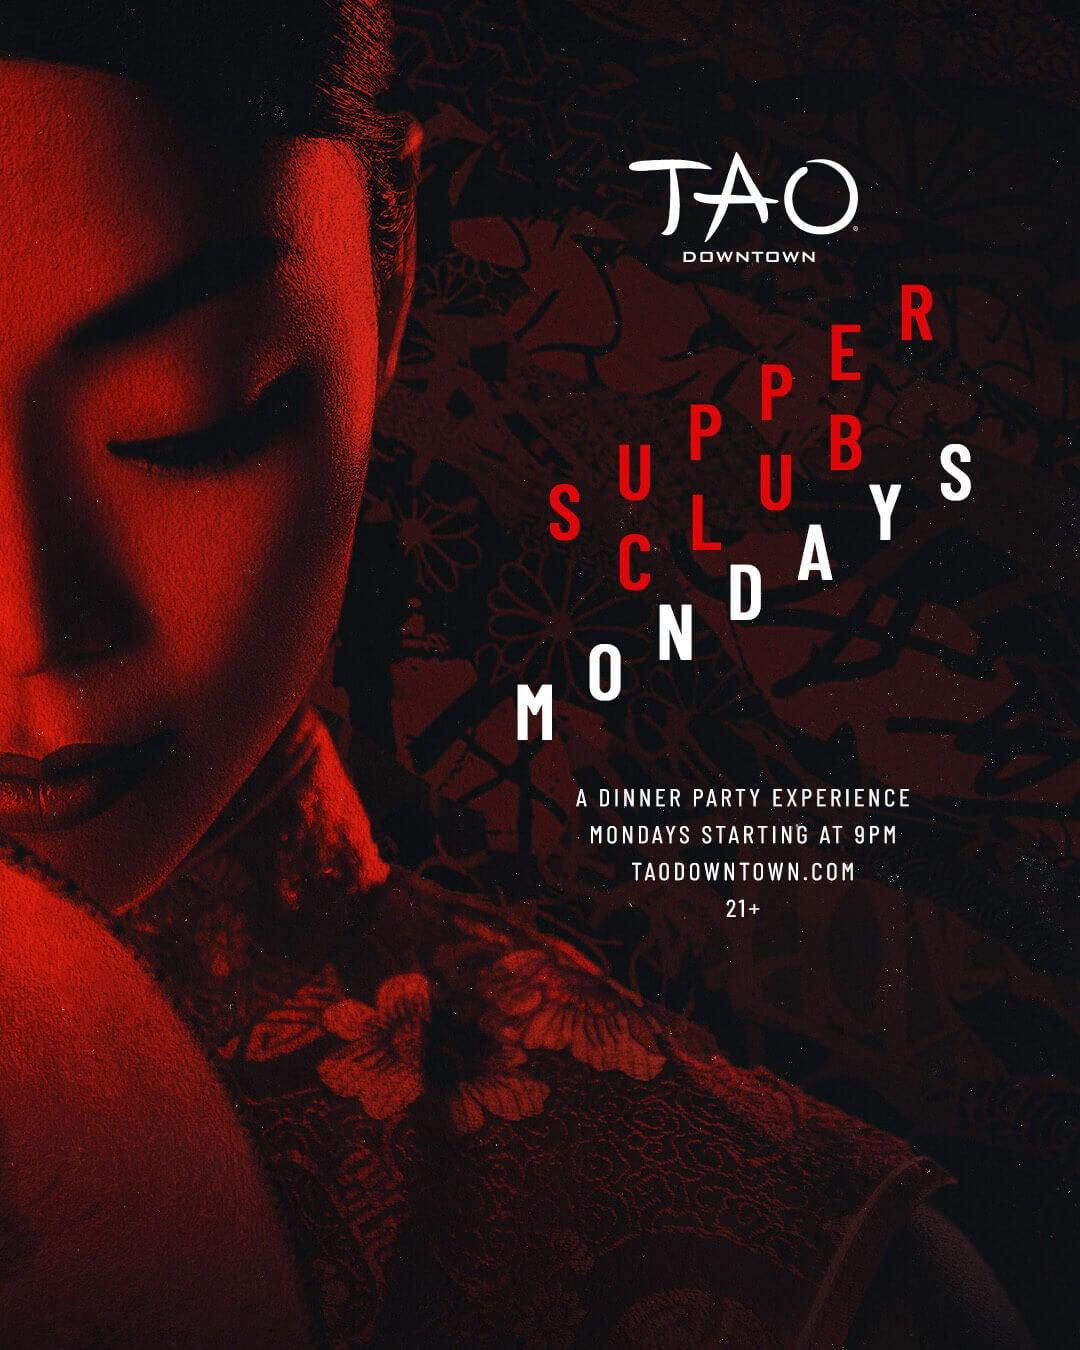 Supper Club Mondays